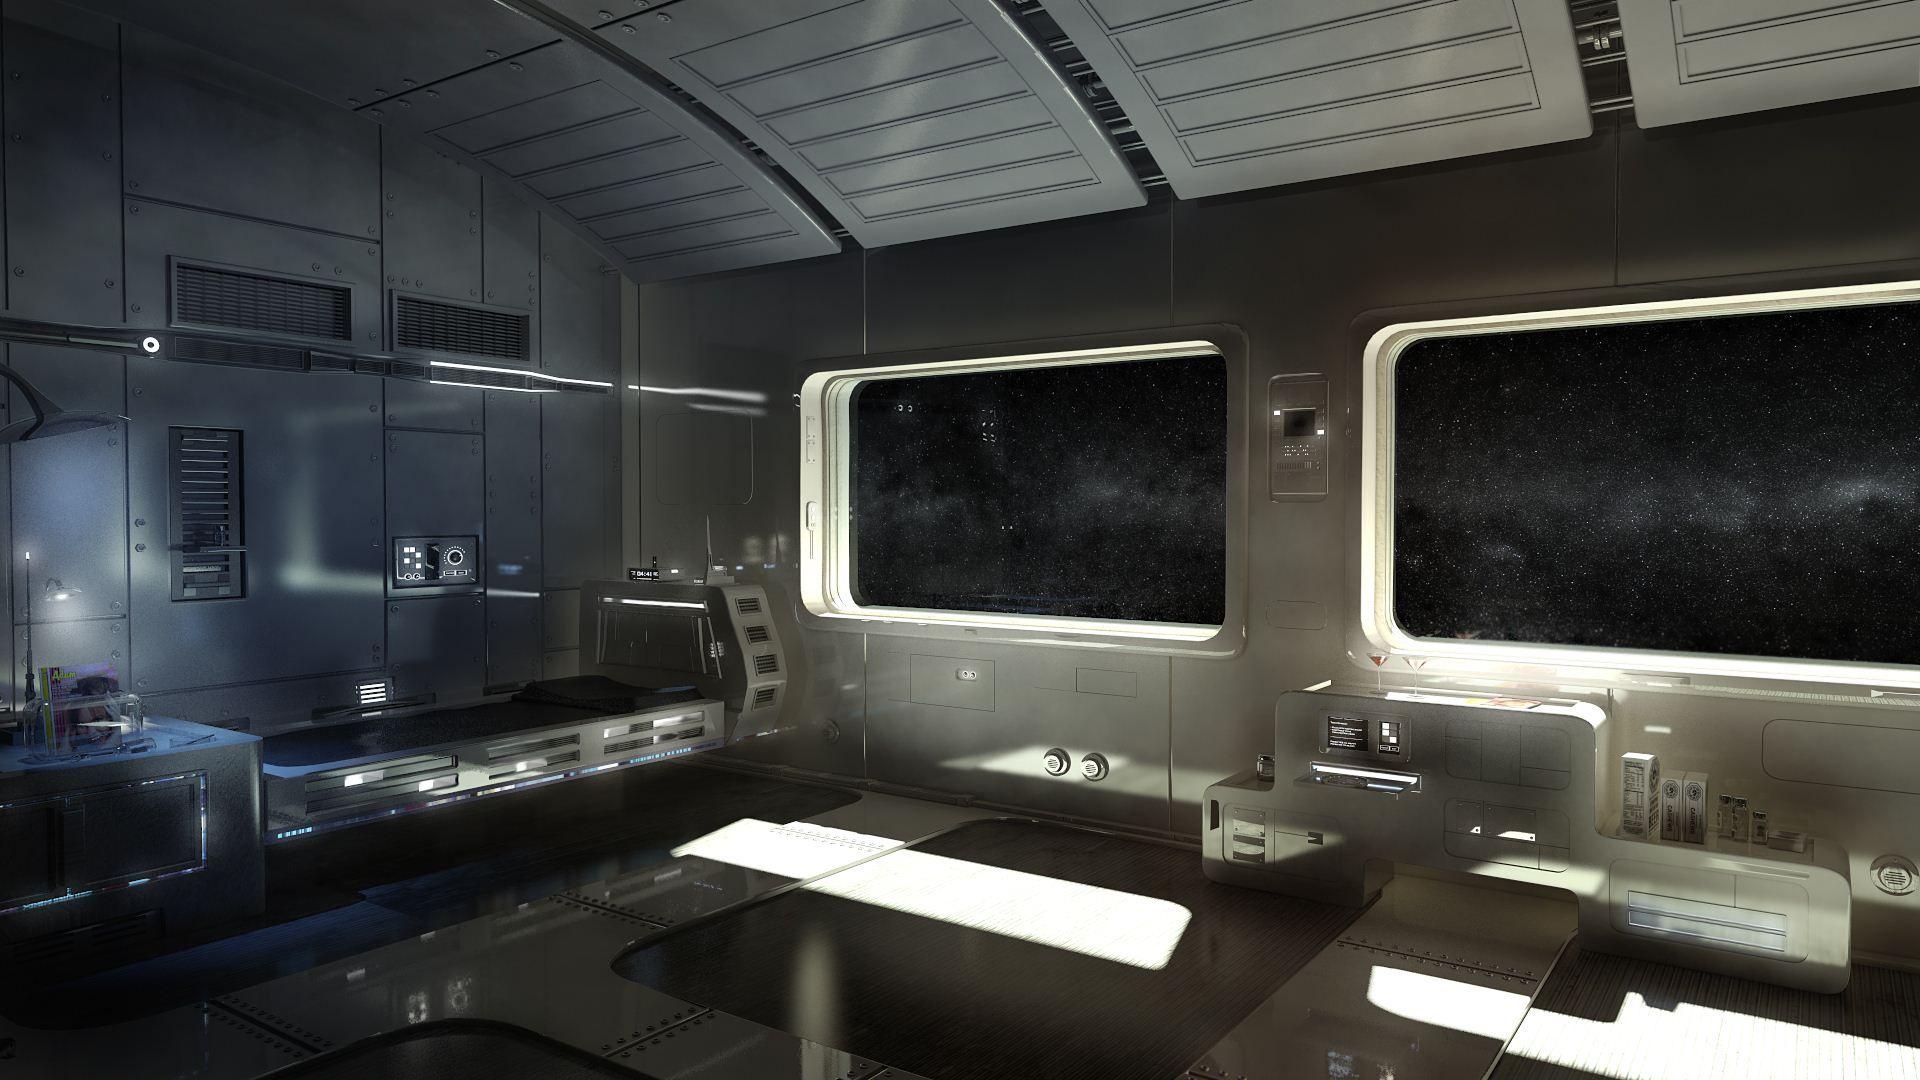 Space Station Spaceship Interior Wallpaper Space Futuristic Interior